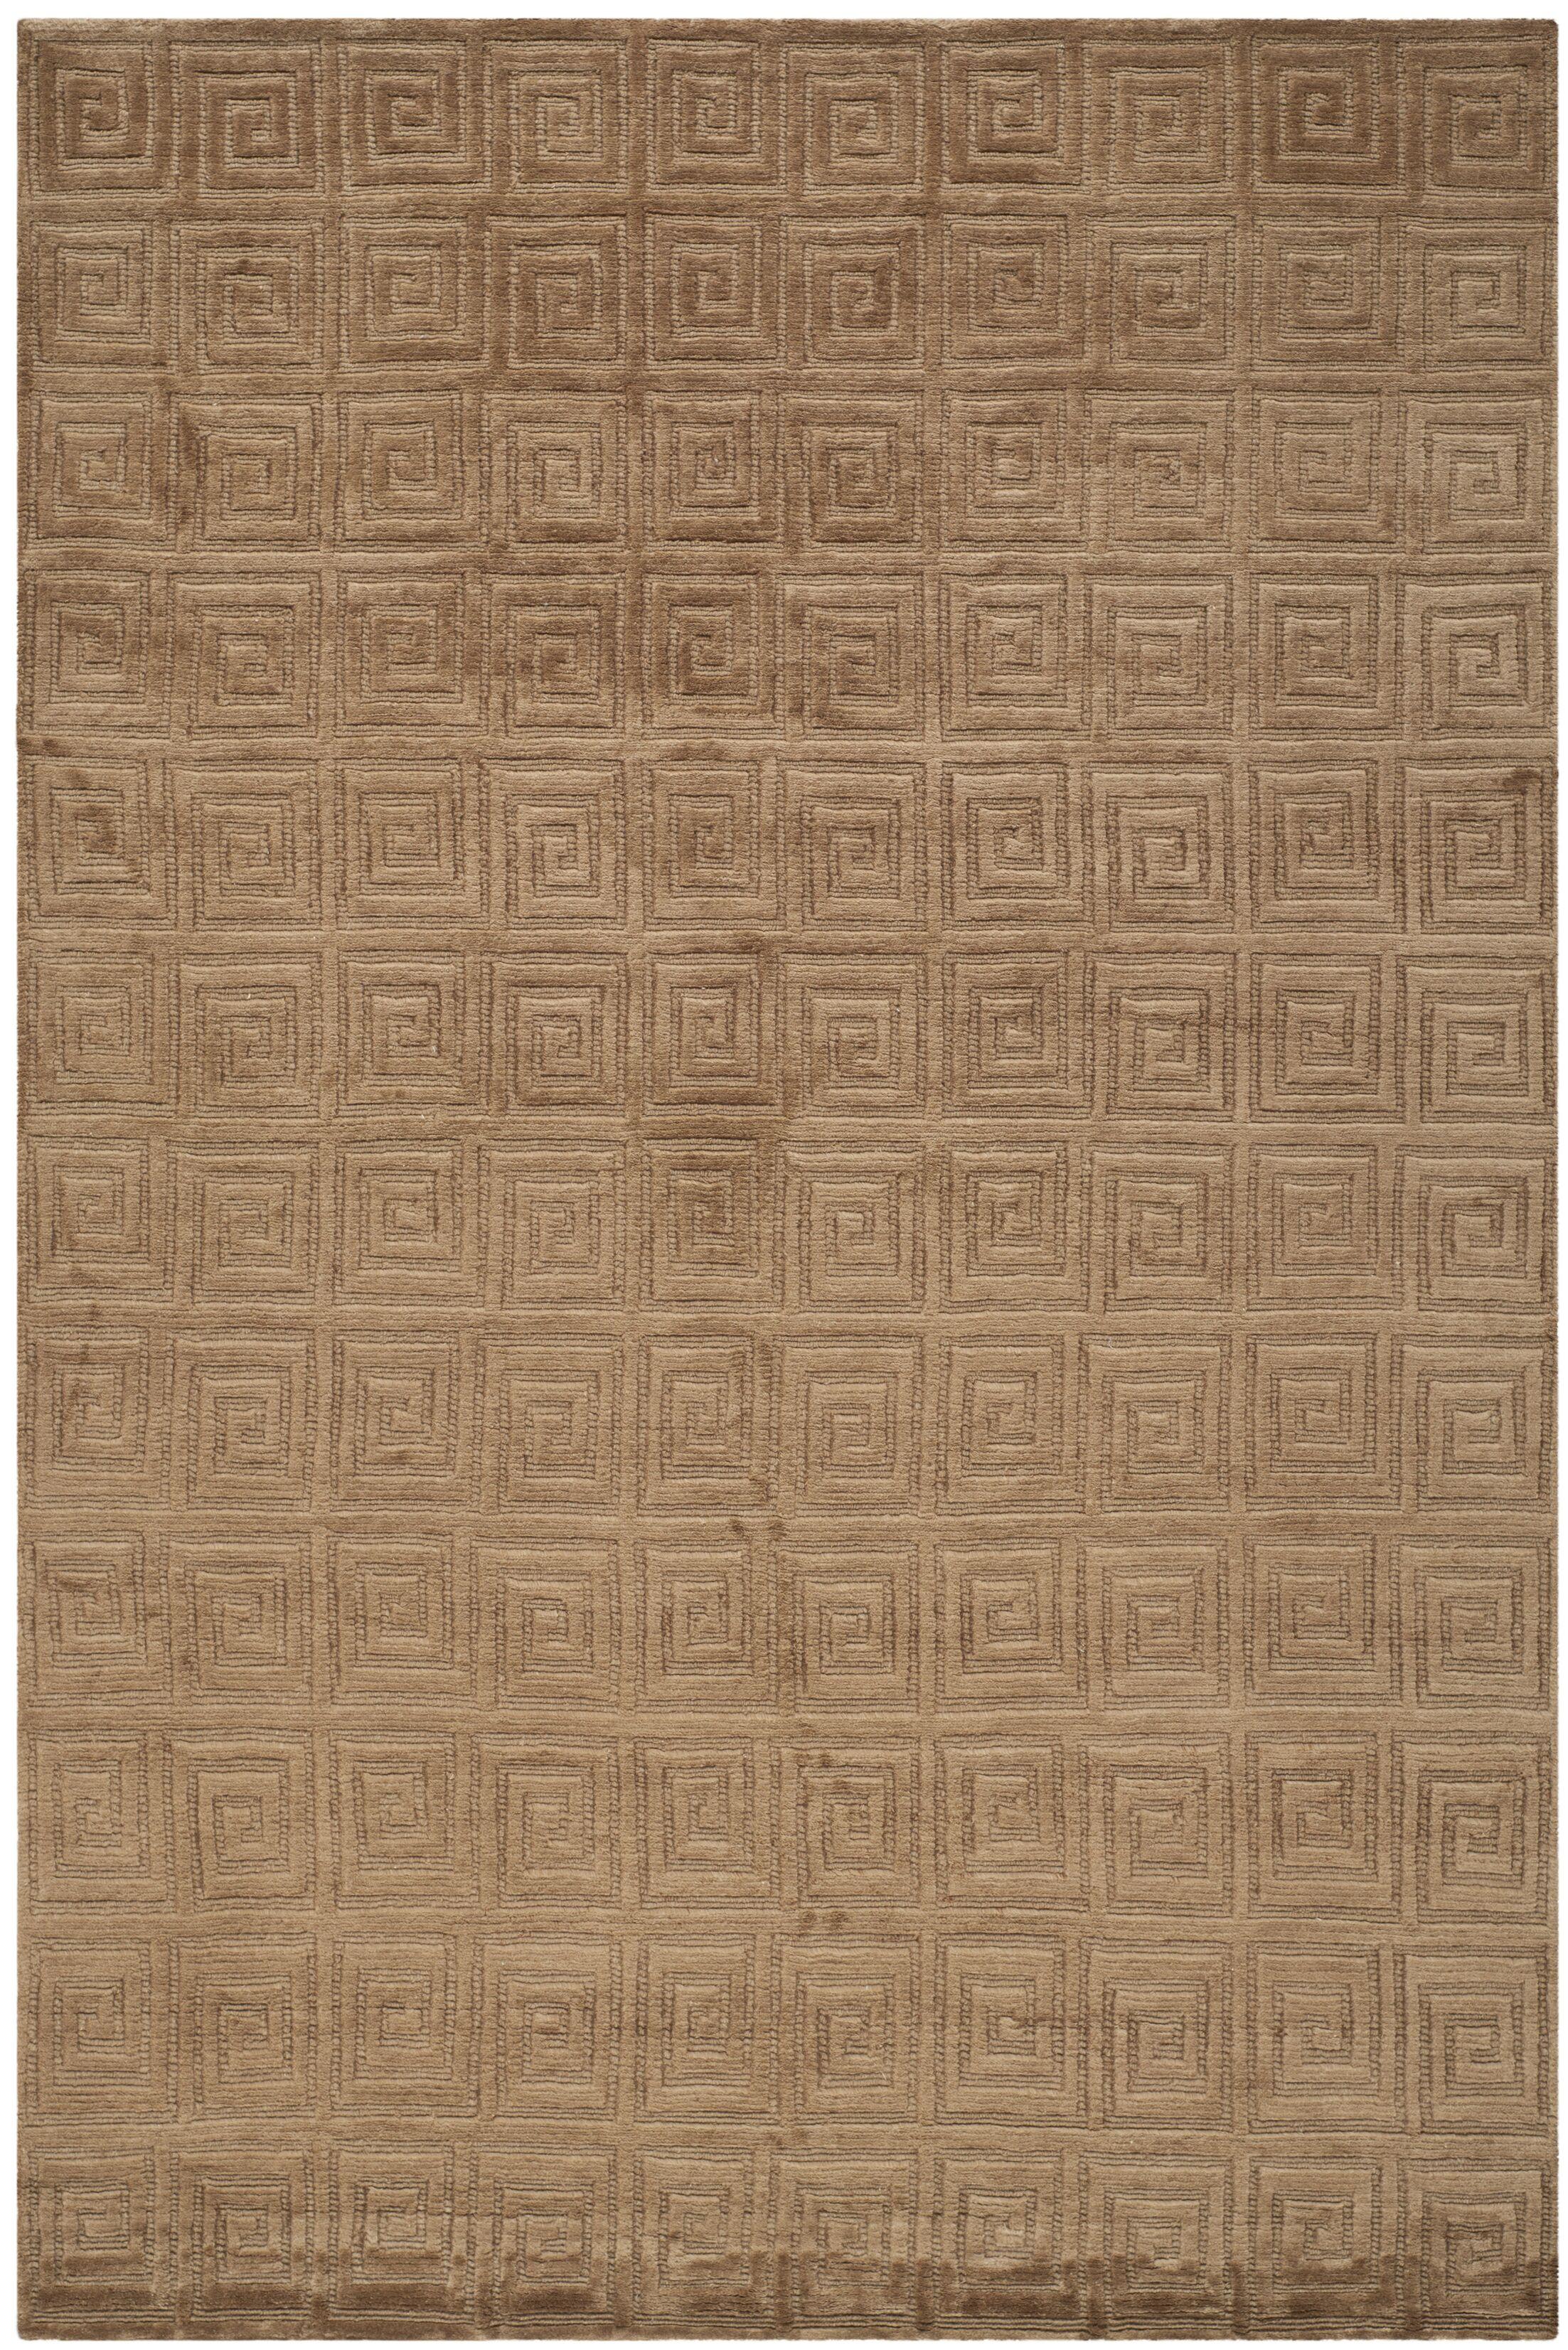 Bronze Greek Key Area Rug Rug Size: Rectangle 6' x 9'